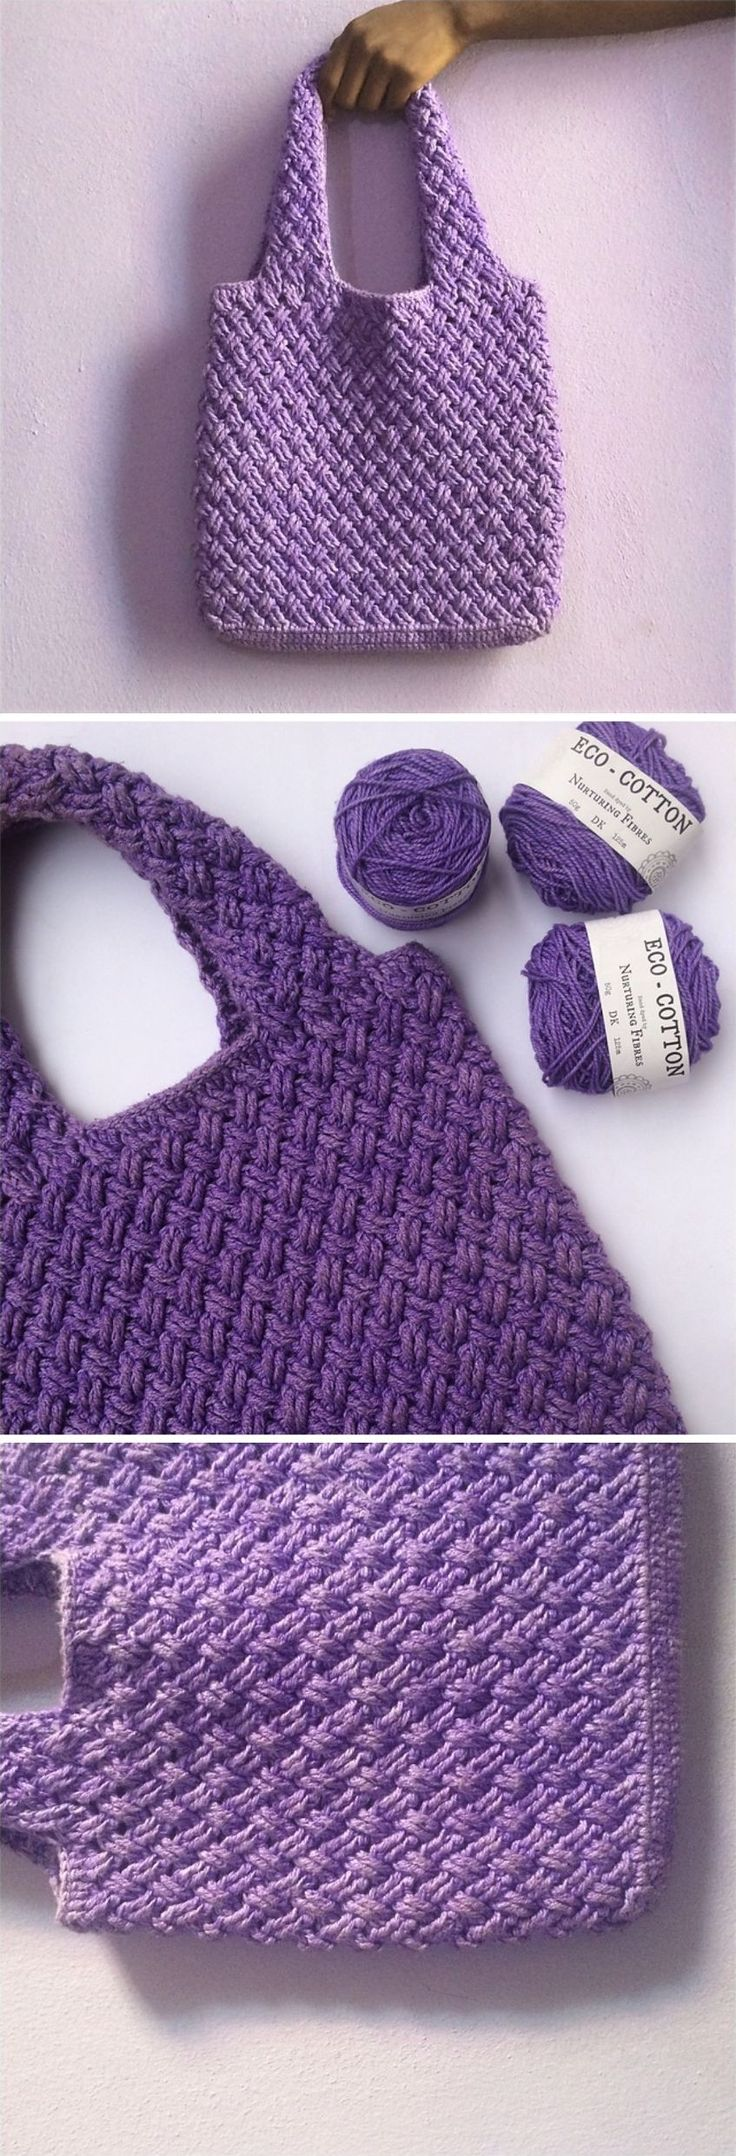 Crochet Celtic Weave Tote